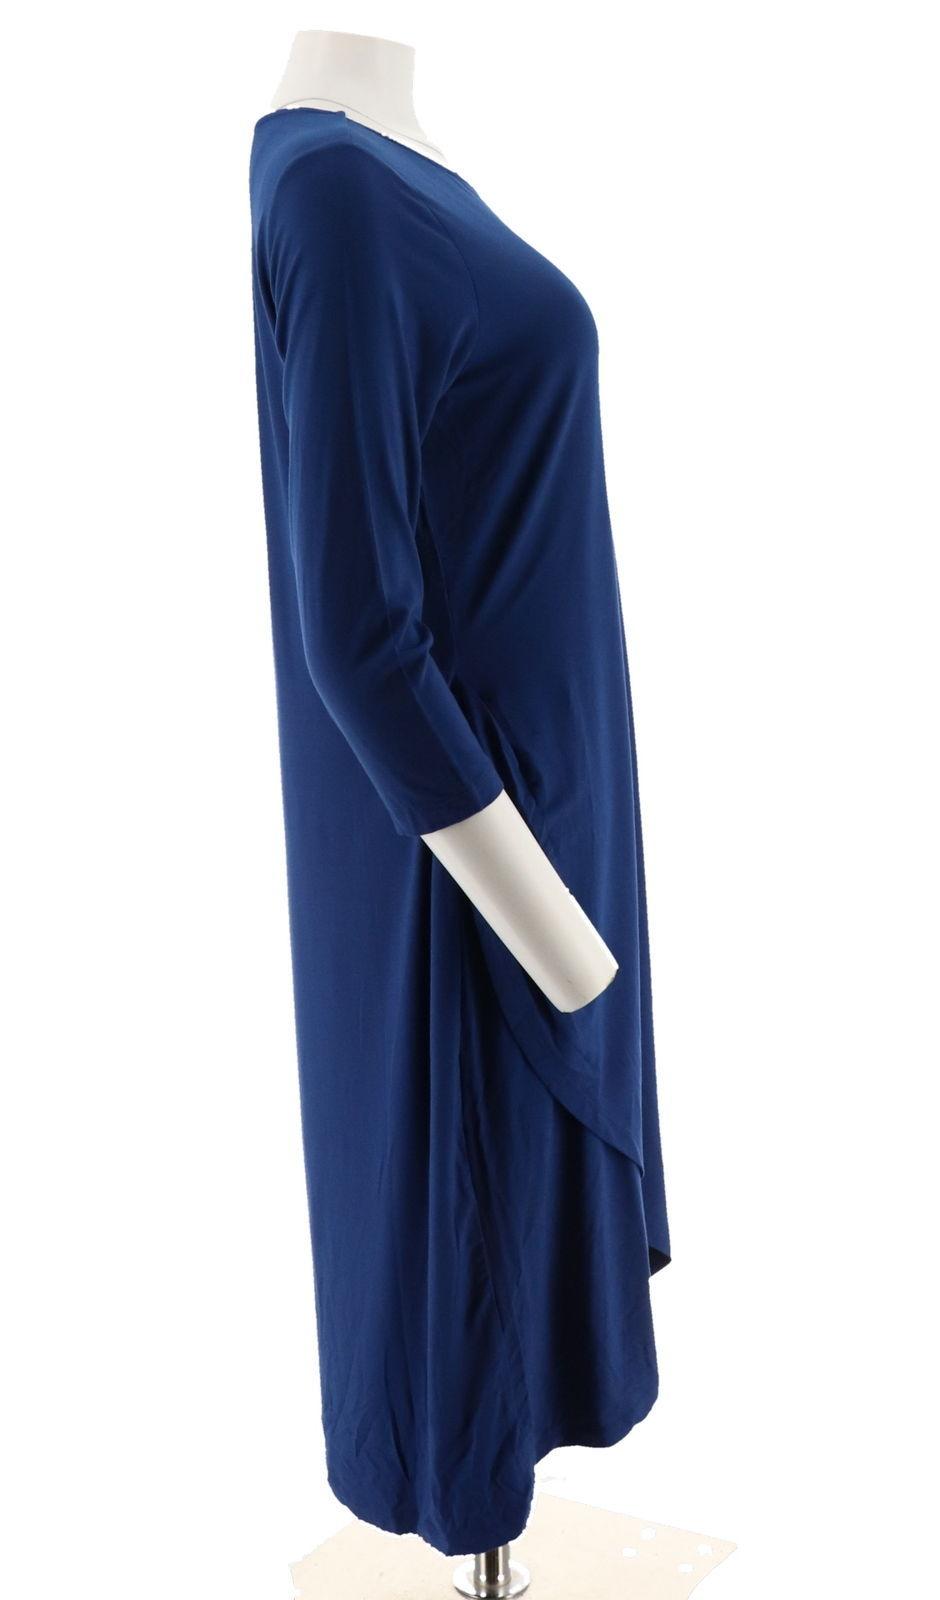 Halston 3/4 Slv Draped Front Crewneck Hi-Low Hem Dress Royal Blue XS NEW A280164 image 4